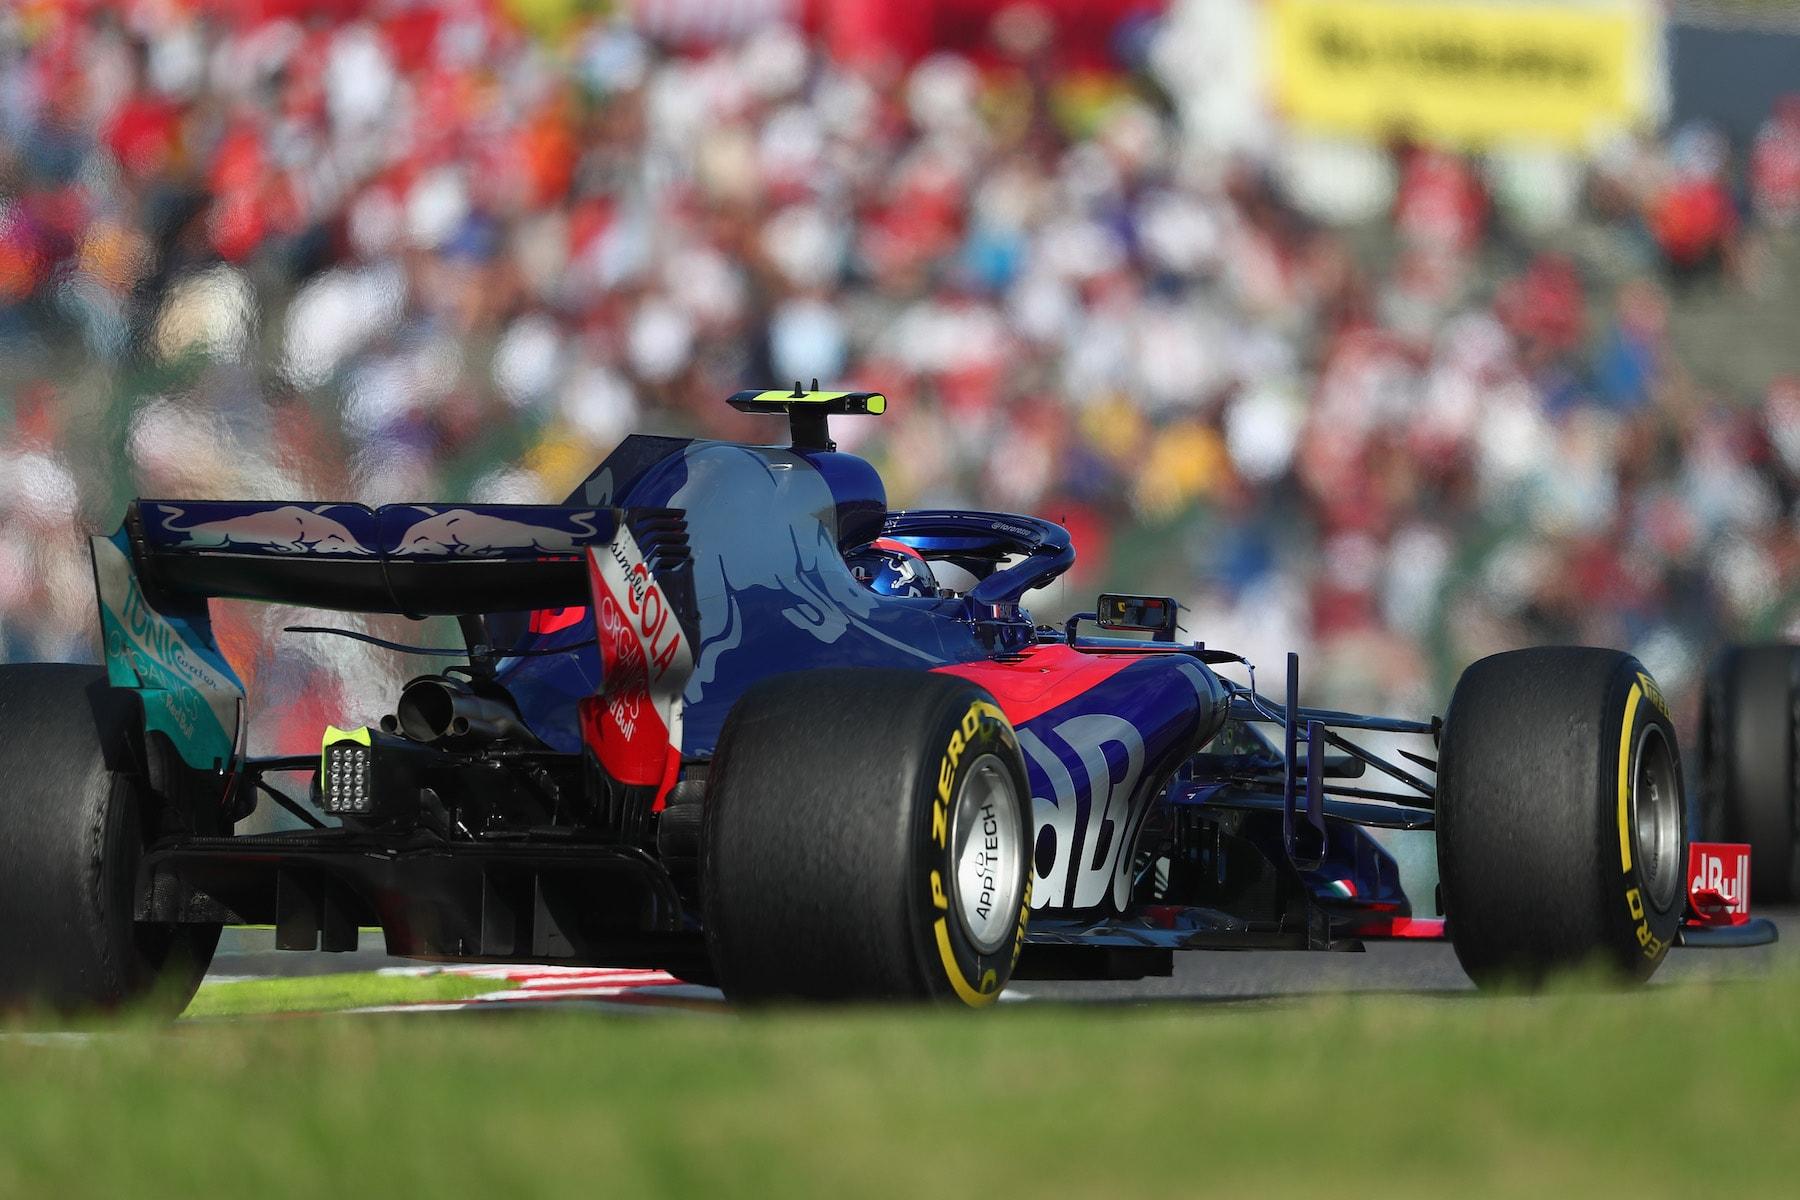 J 2018 Pierre Gasly | Toro Rosso STR13 | 2018 Japanese GP 2 copy.jpg